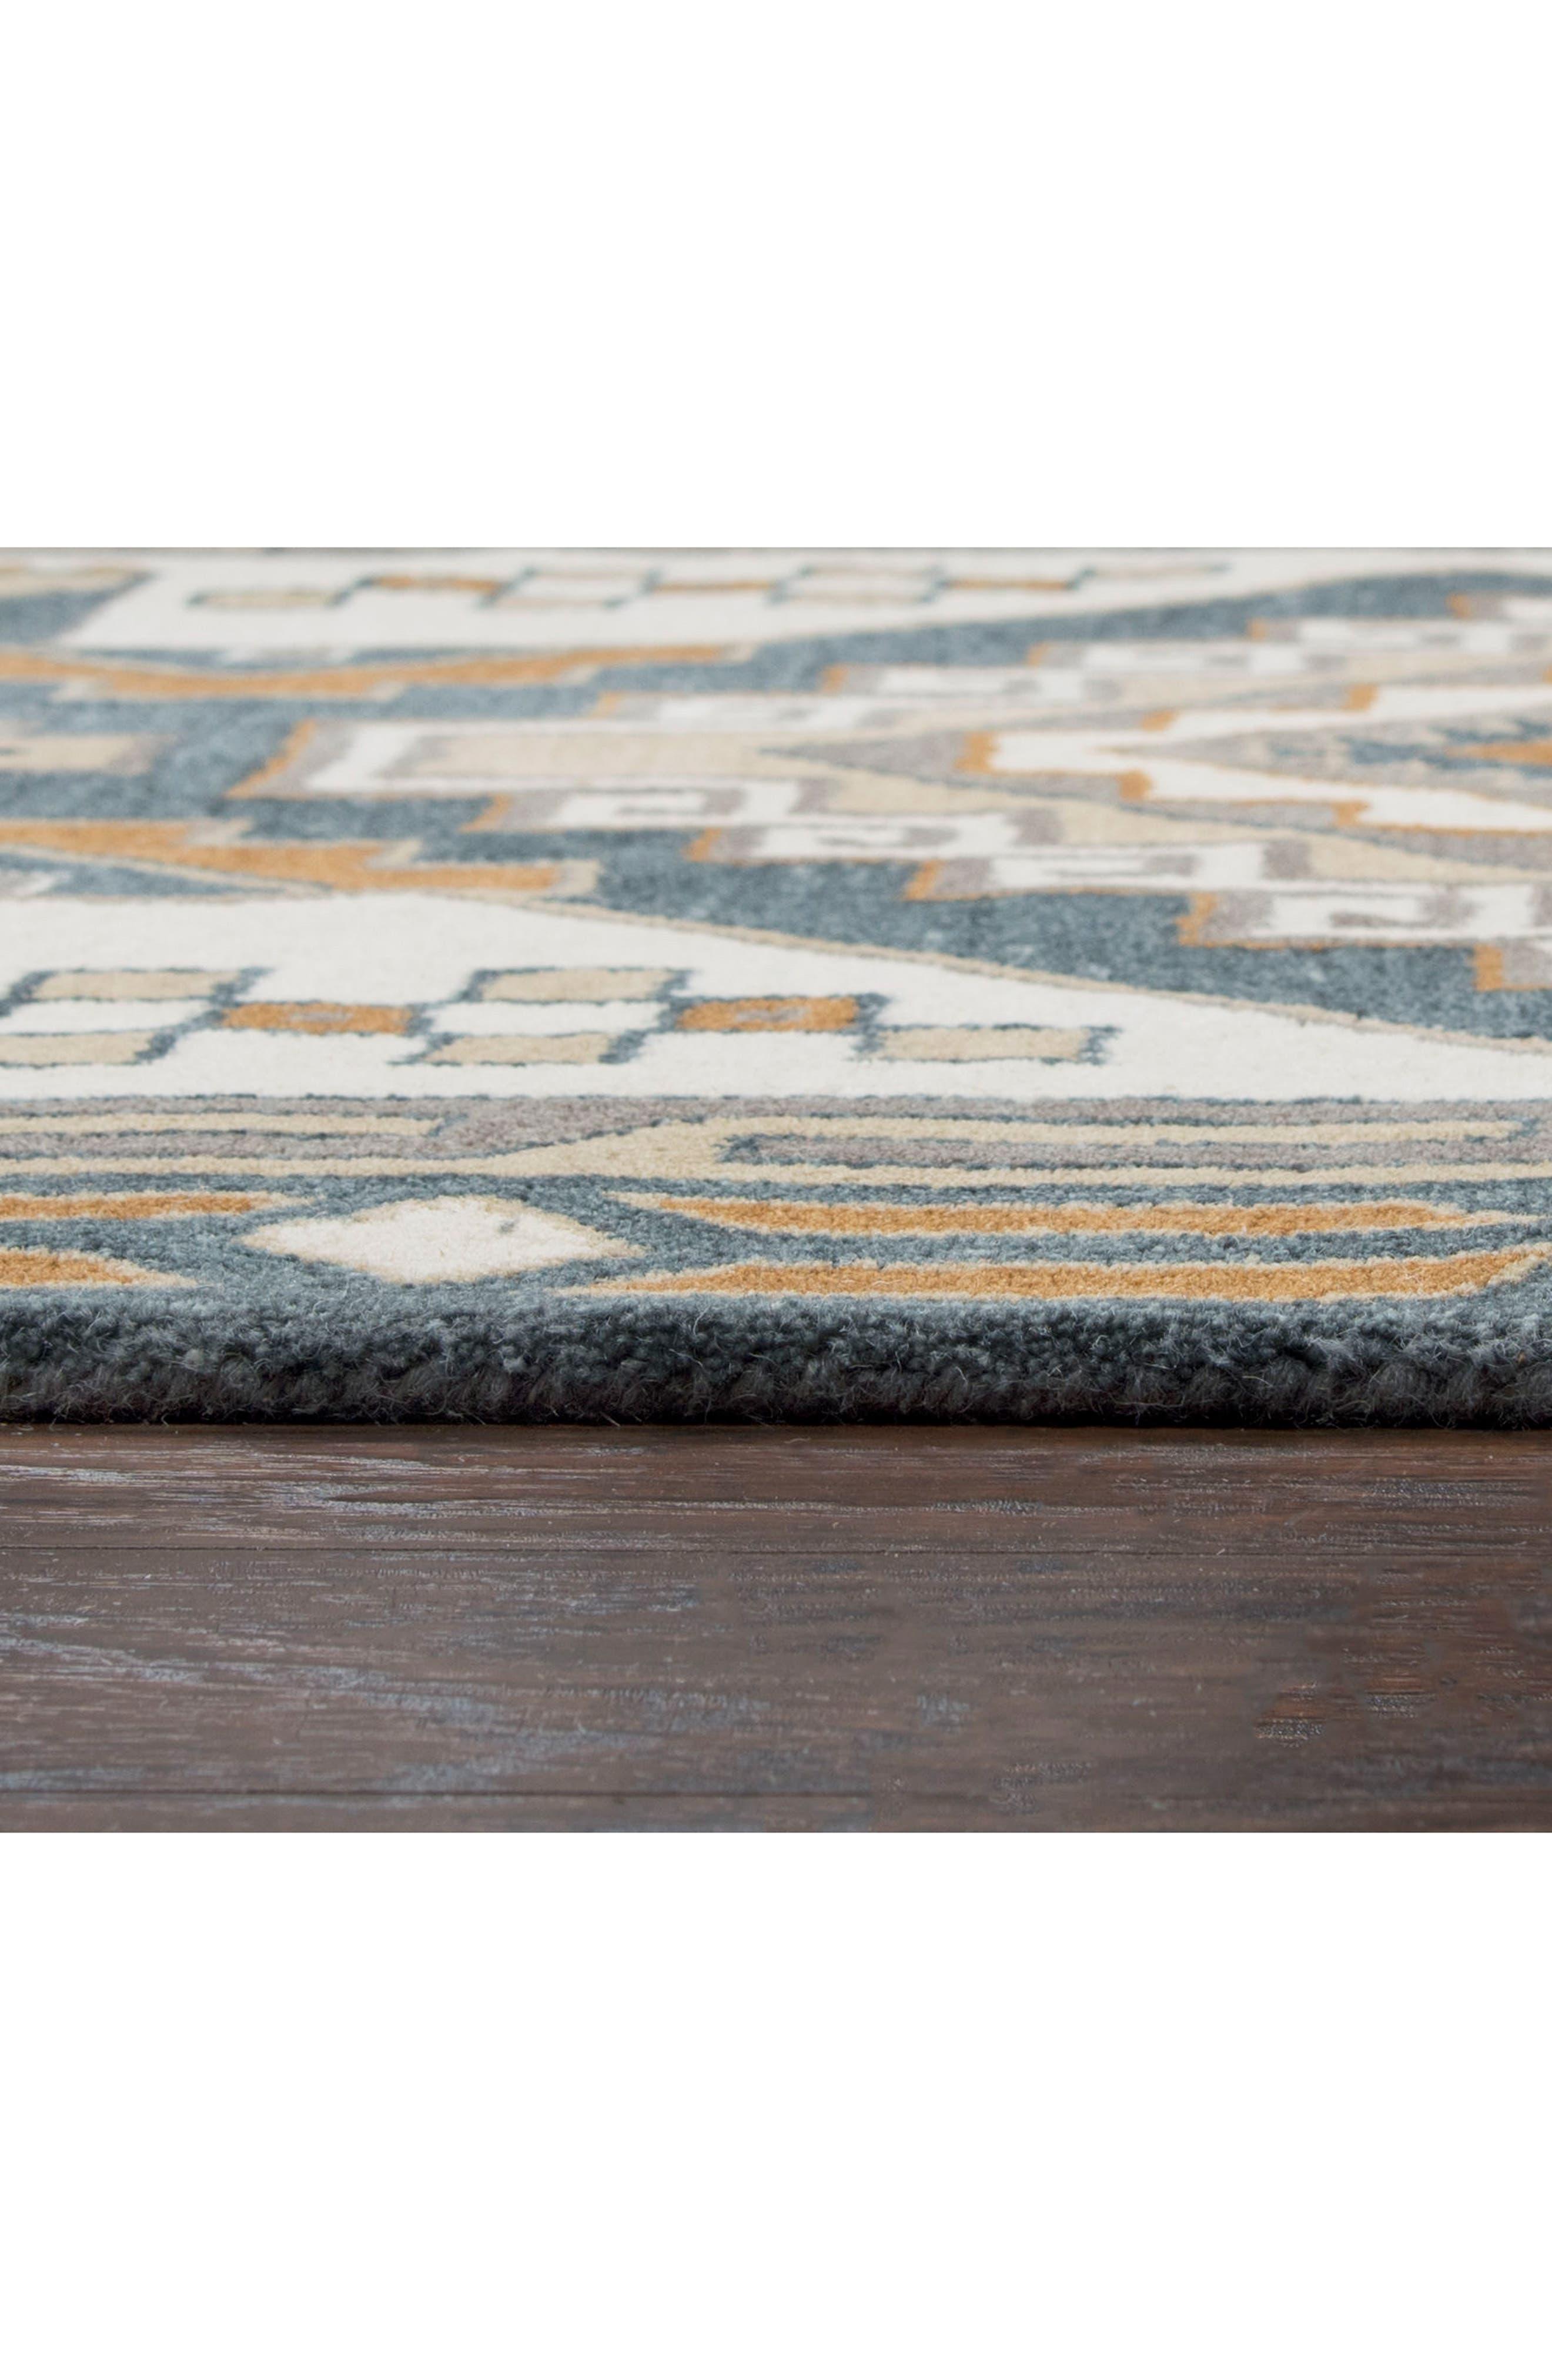 Urban Tiles Hand Tufted Wool Rug,                             Alternate thumbnail 2, color,                             220